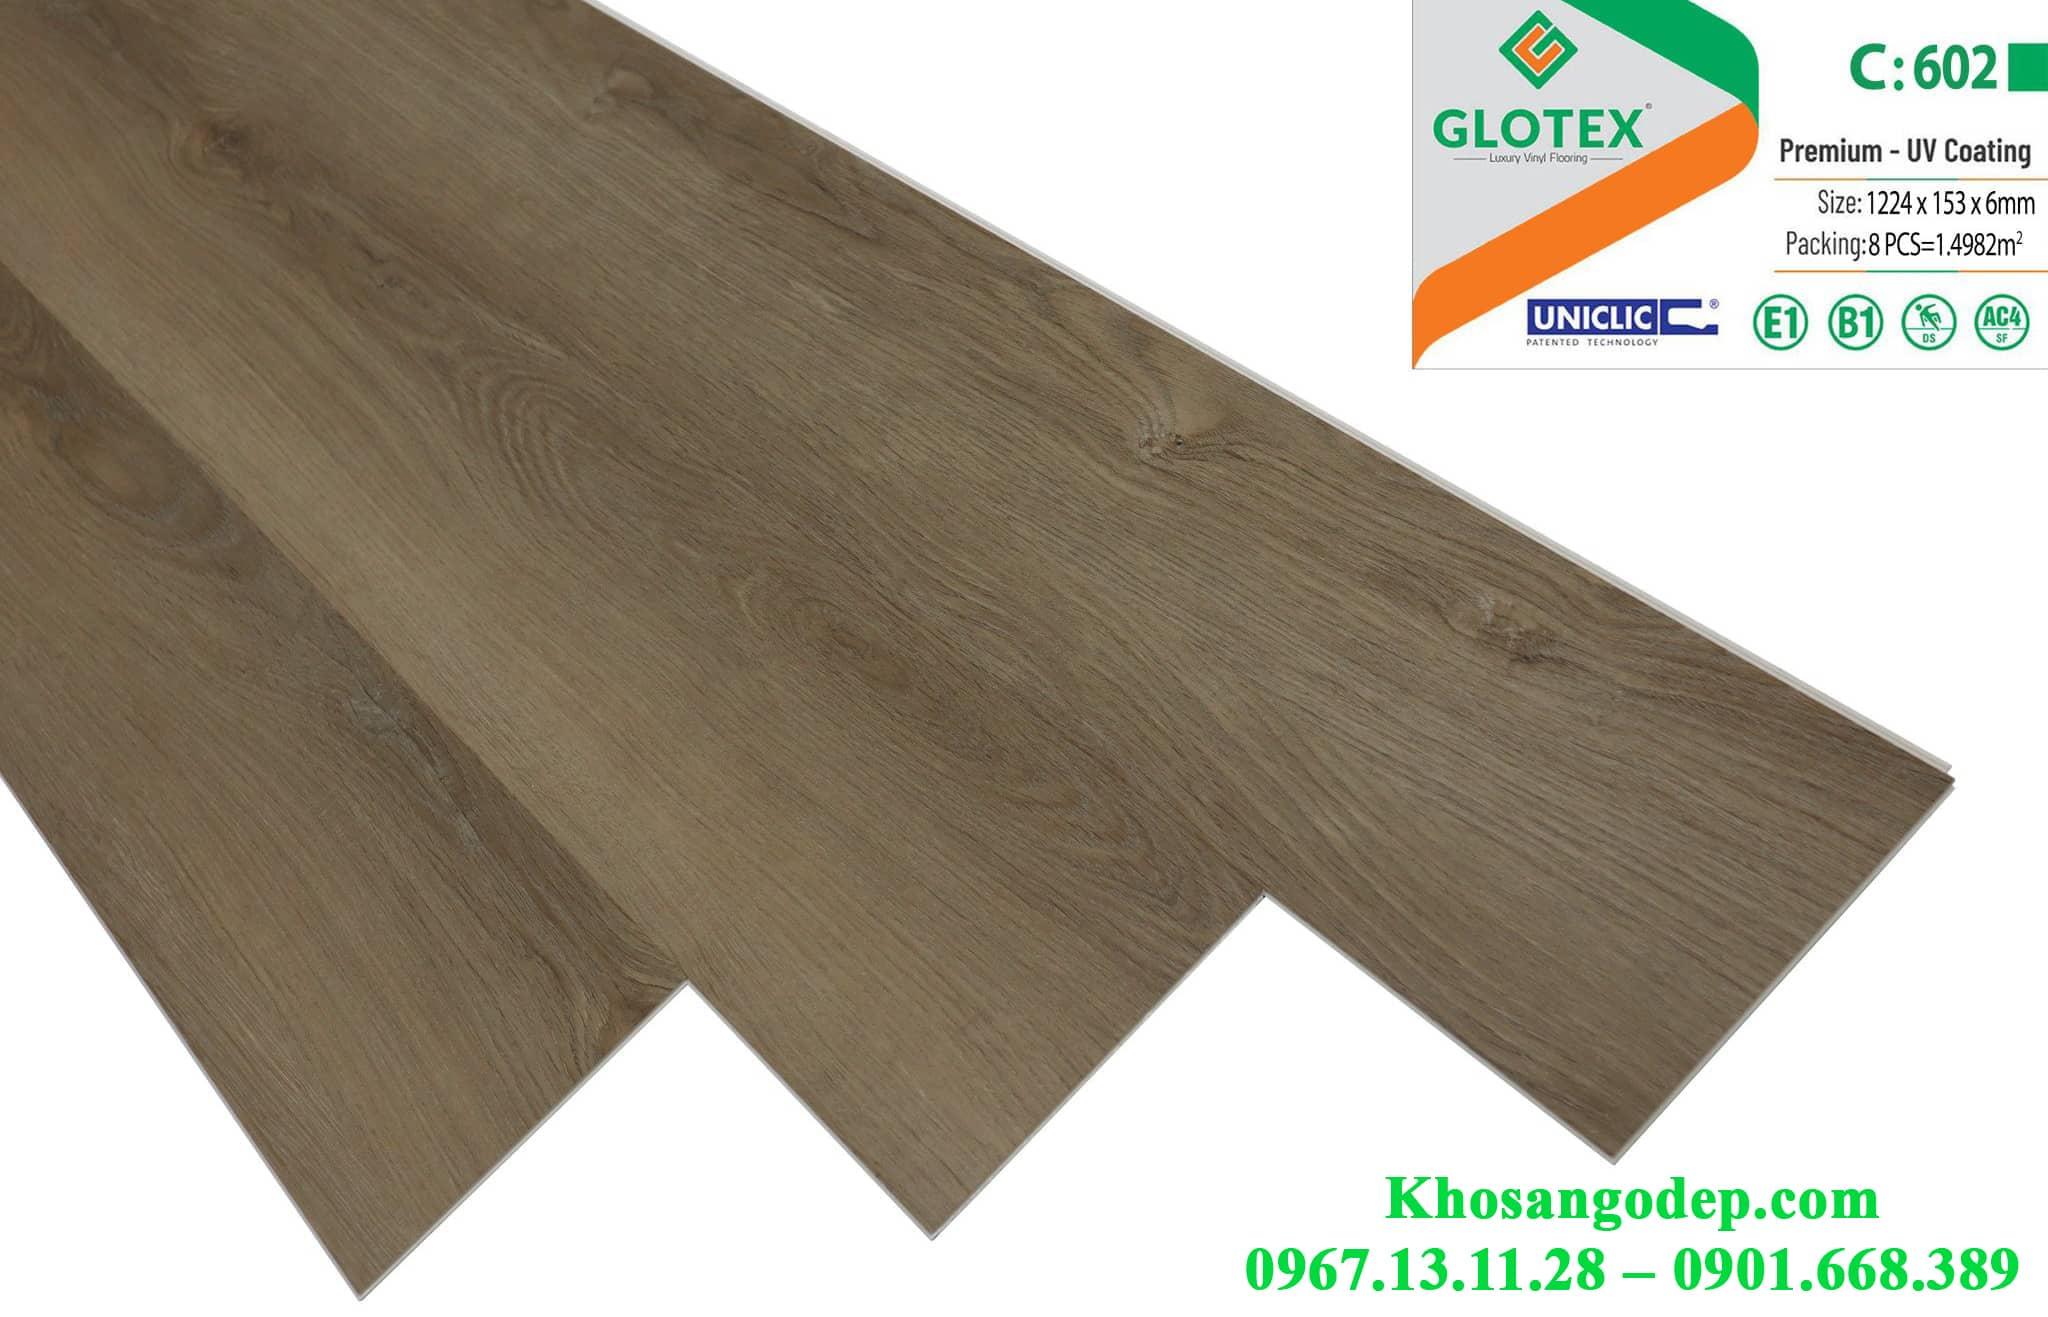 Sàn nhựa Glotex C602